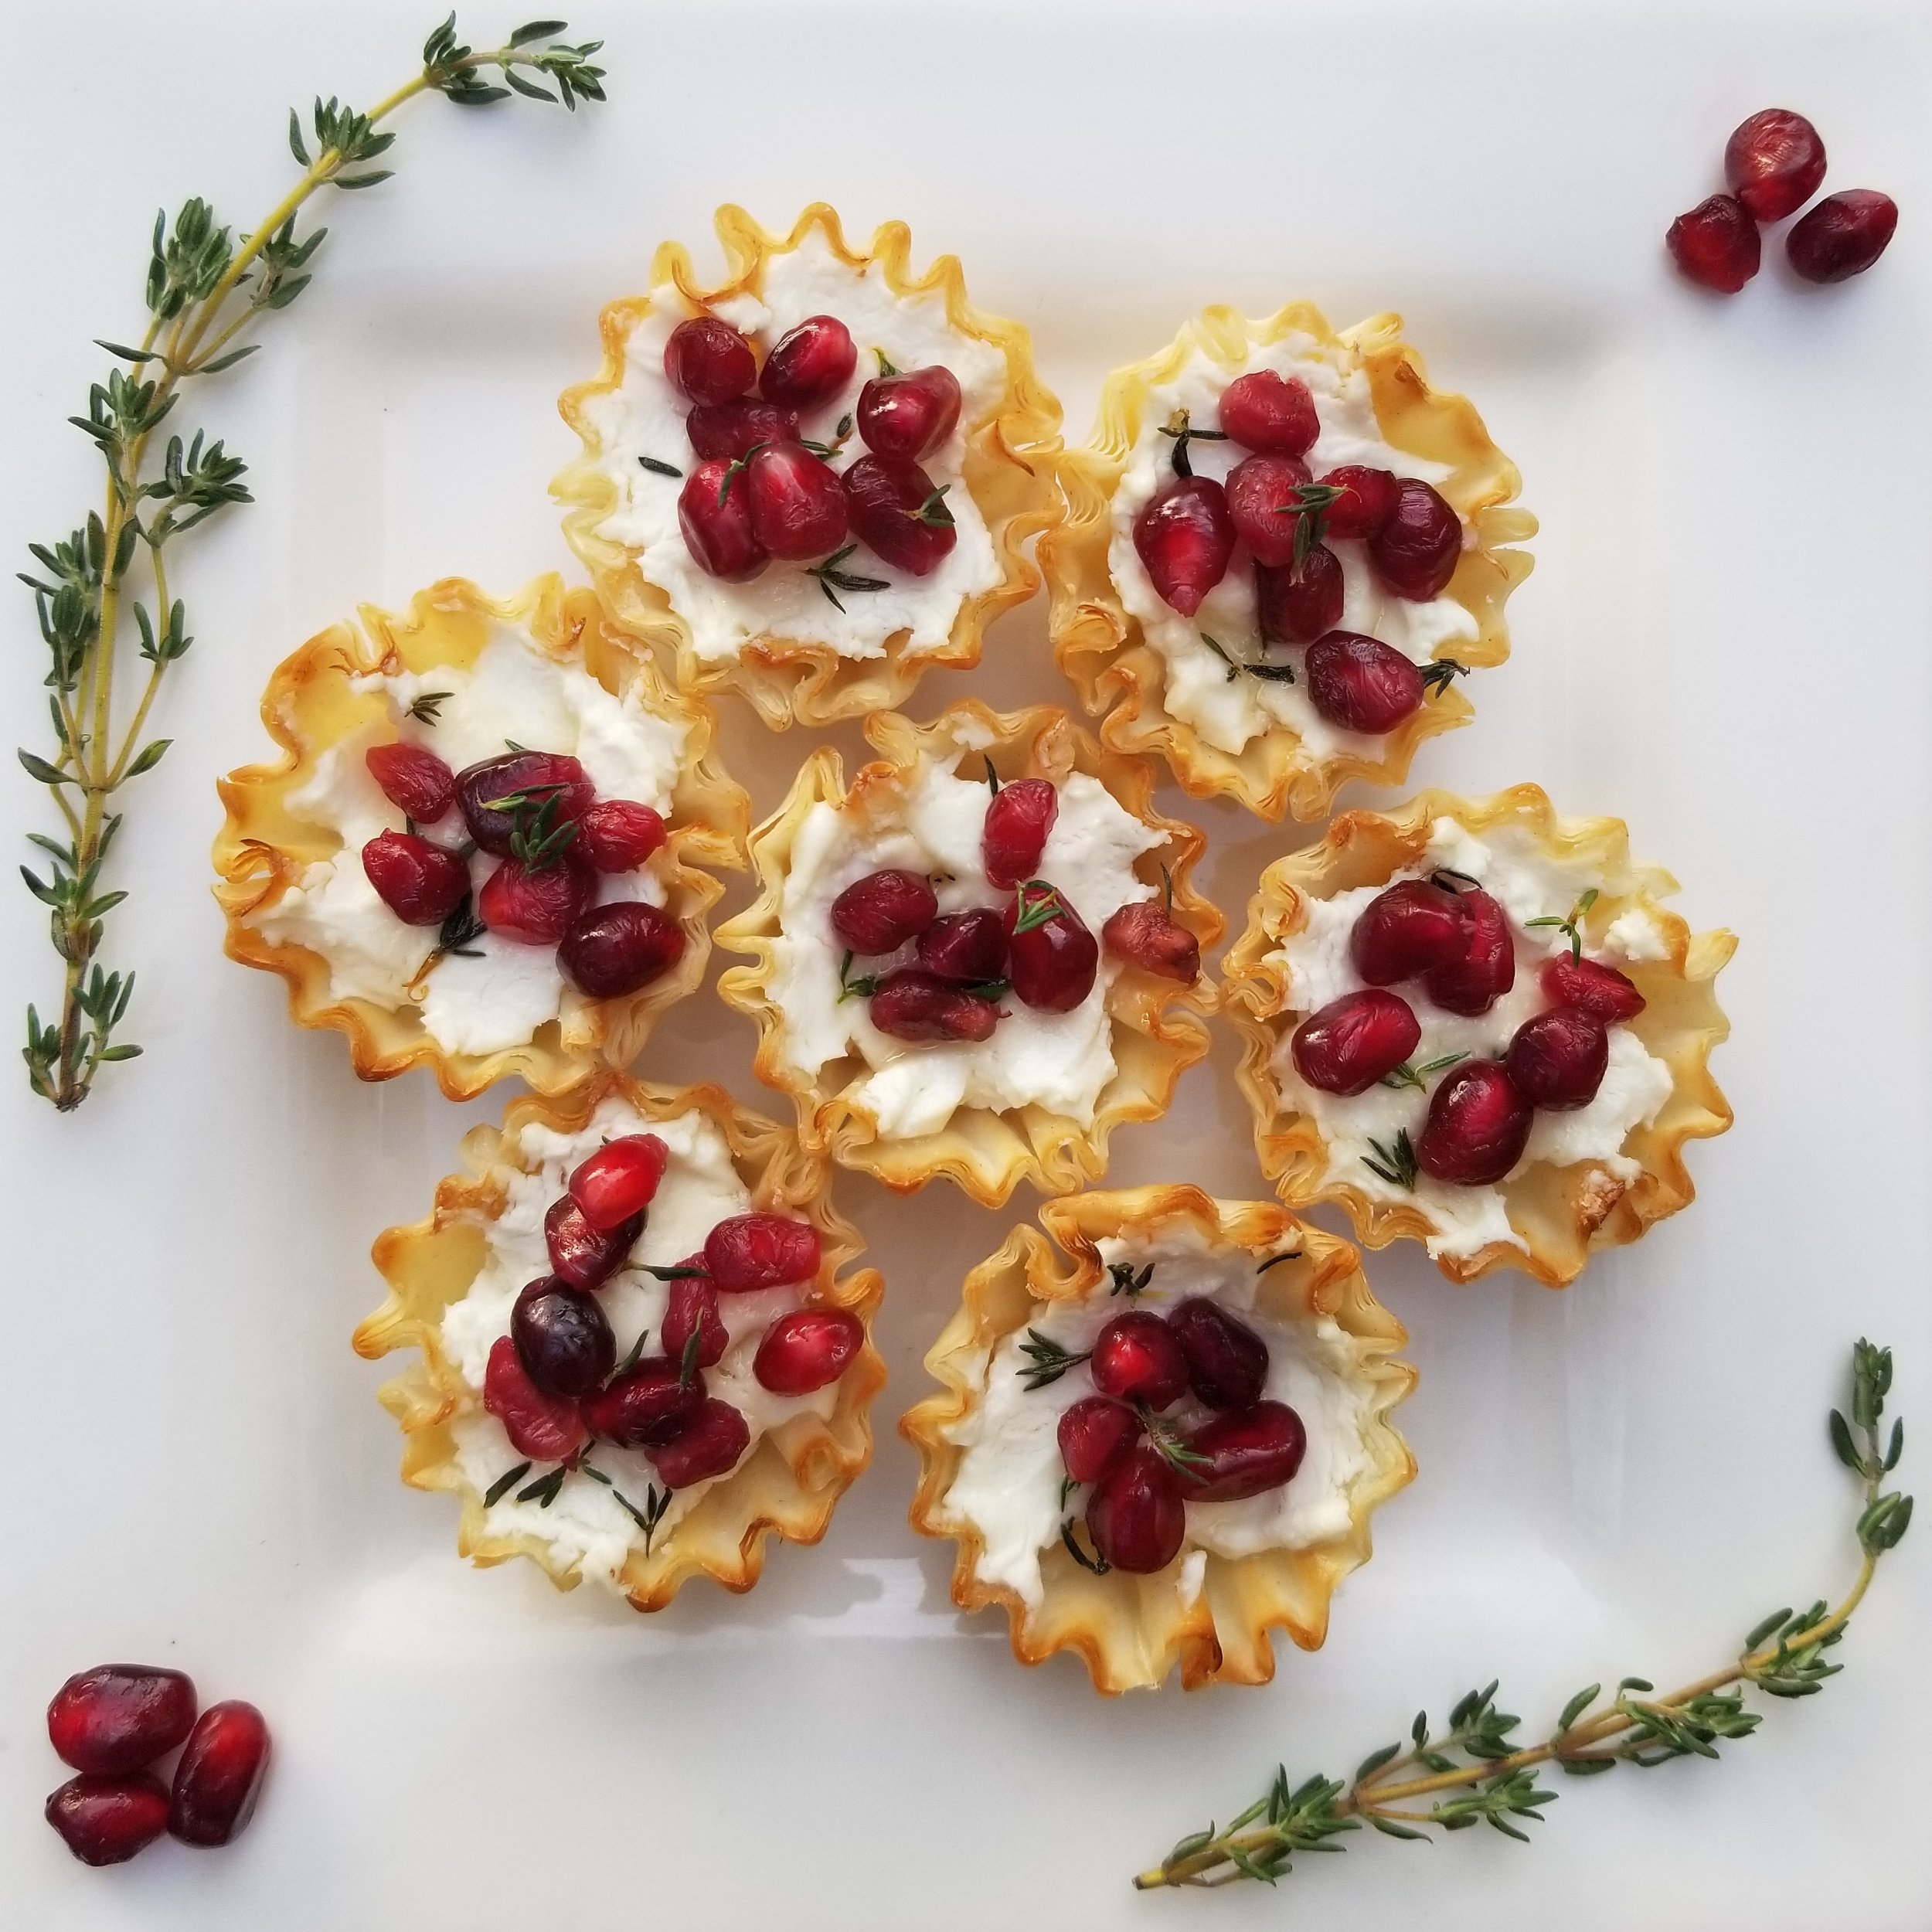 Goat Cheese Bites